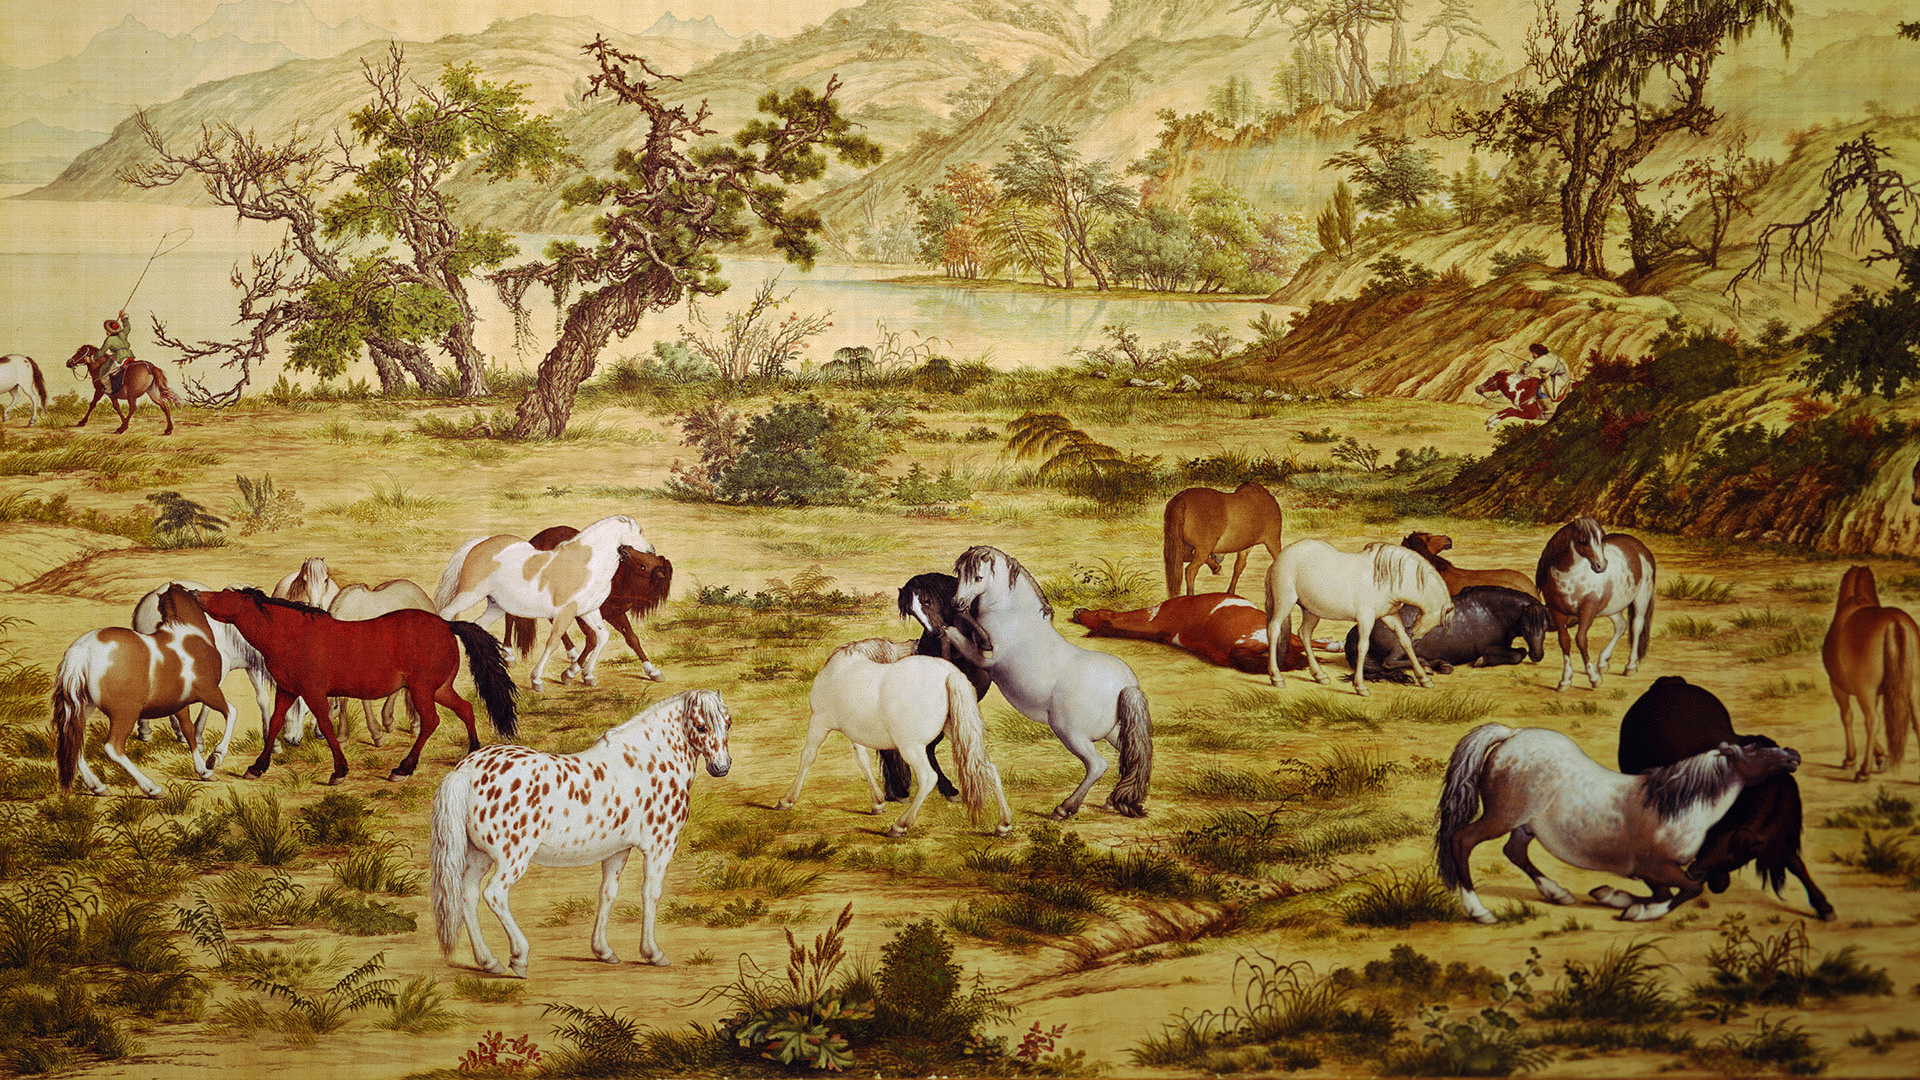 Painting Anime One Hundred Horses